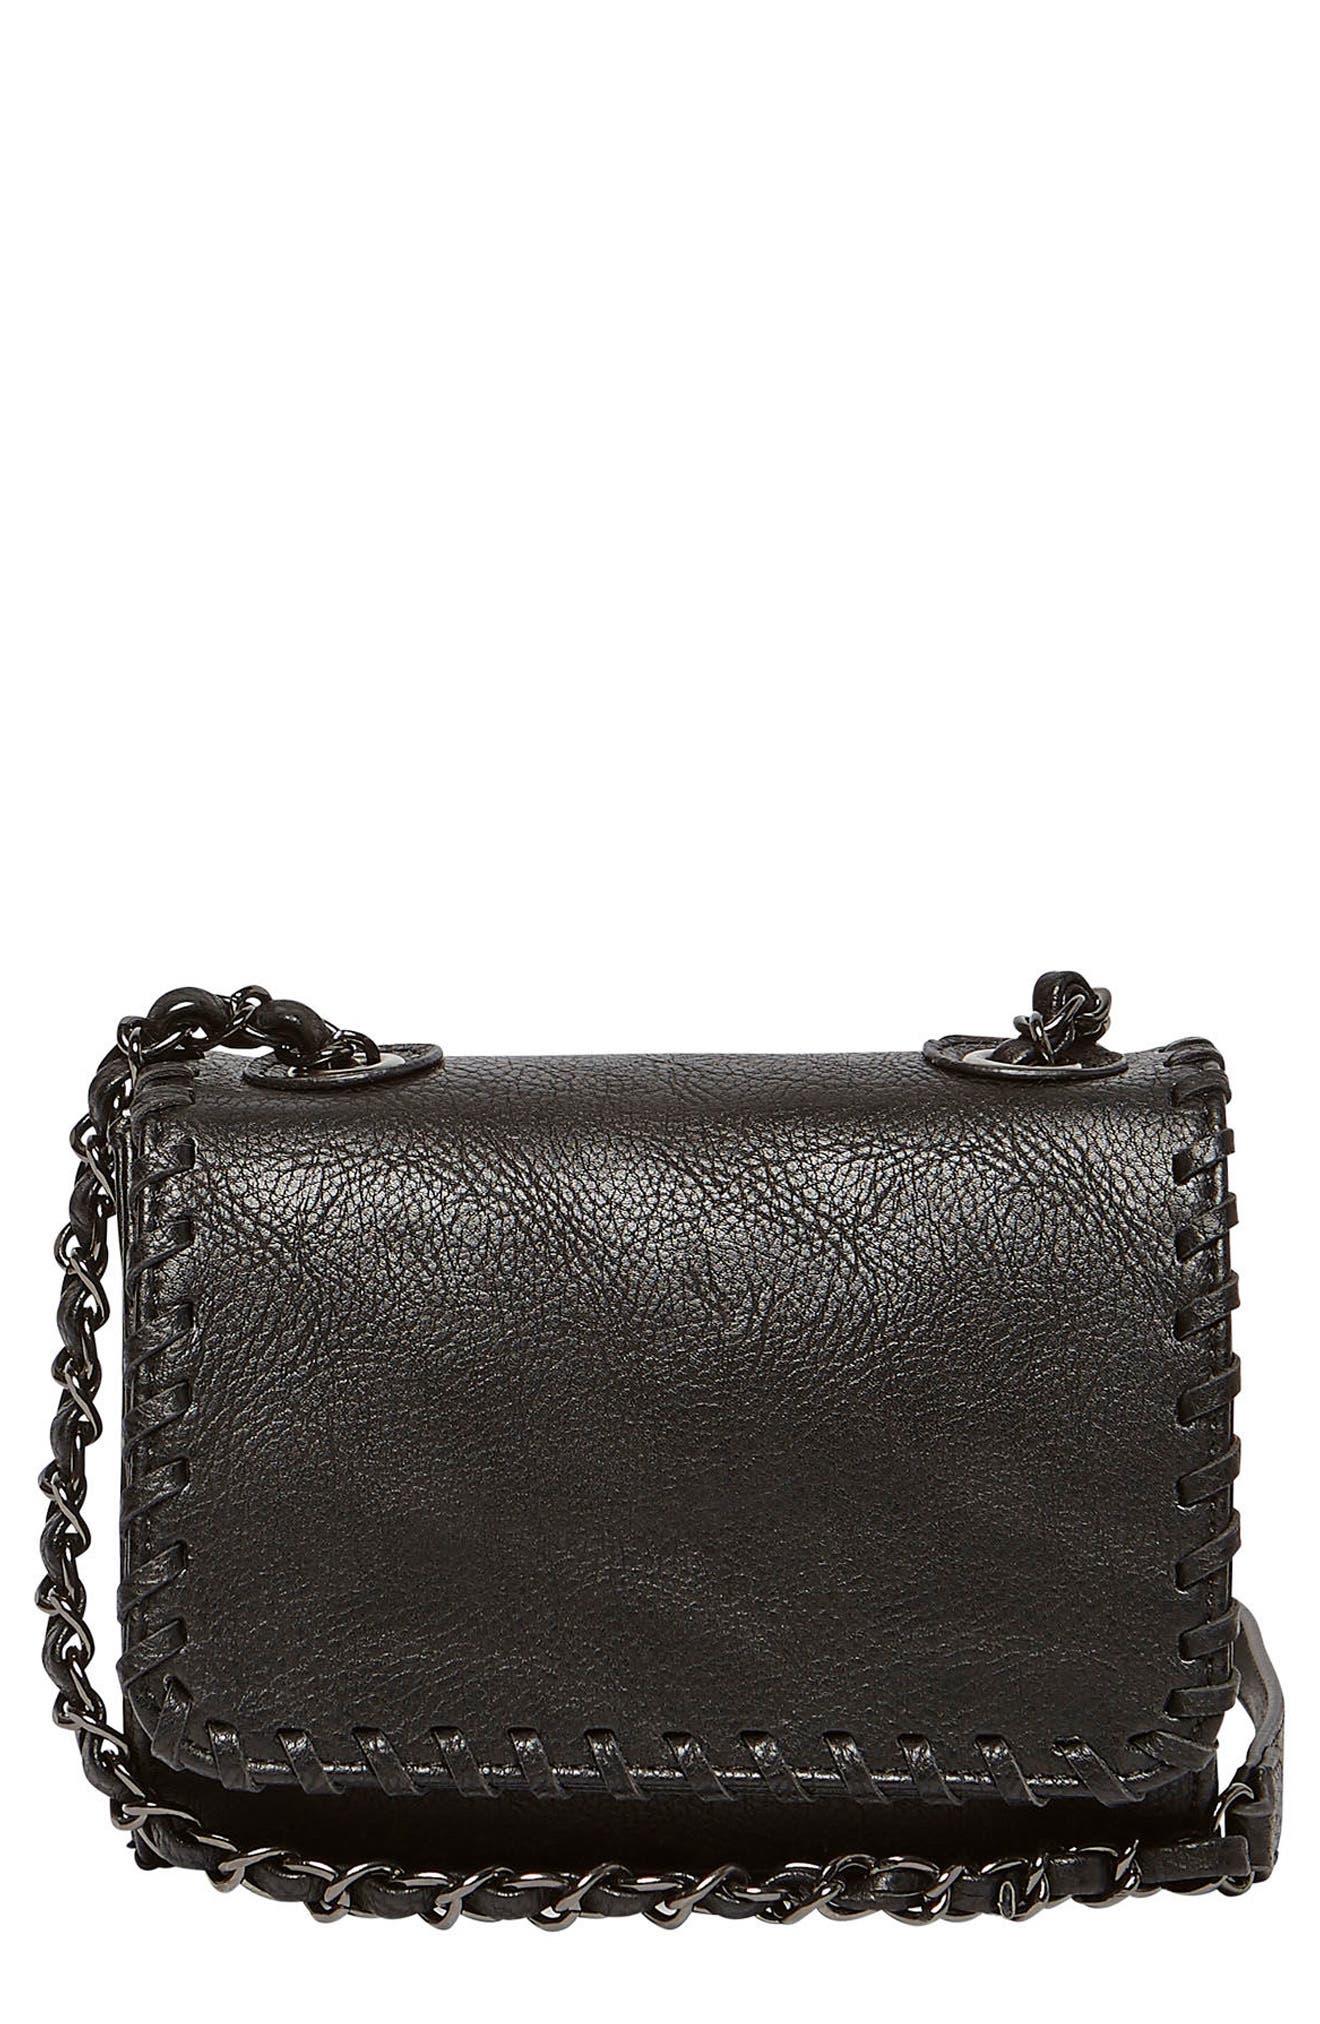 Loveliness Vegan Leather Shoulder Bag,                             Main thumbnail 1, color,                             001